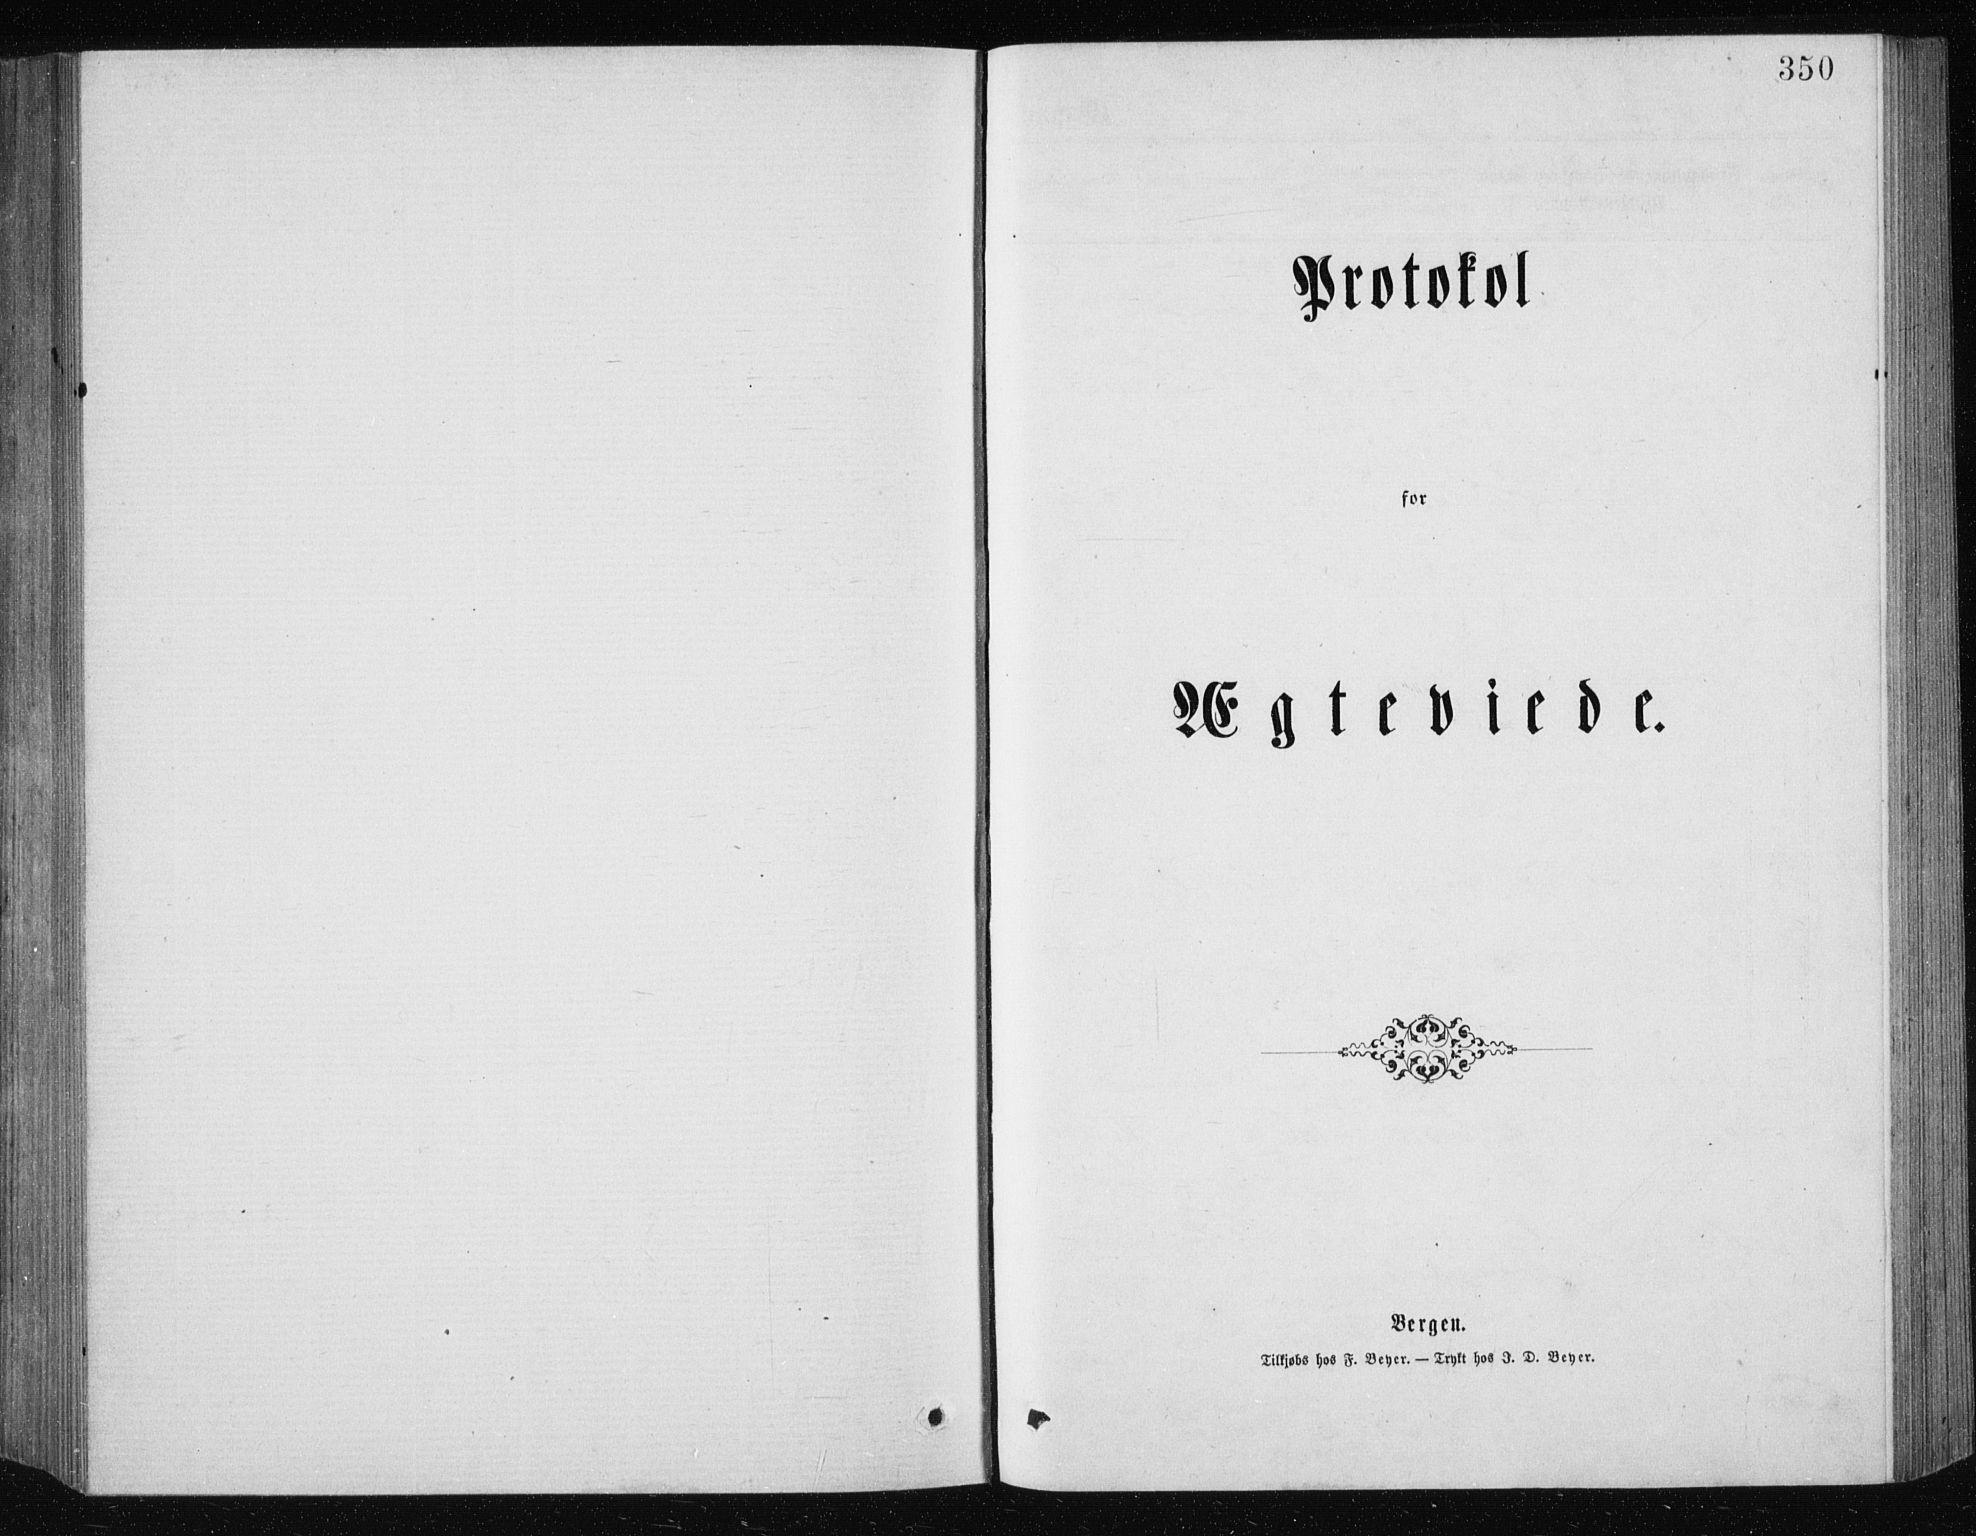 SAT, Ministerialprotokoller, klokkerbøker og fødselsregistre - Nordland, 801/L0031: Klokkerbok nr. 801C06, 1883-1887, s. 350